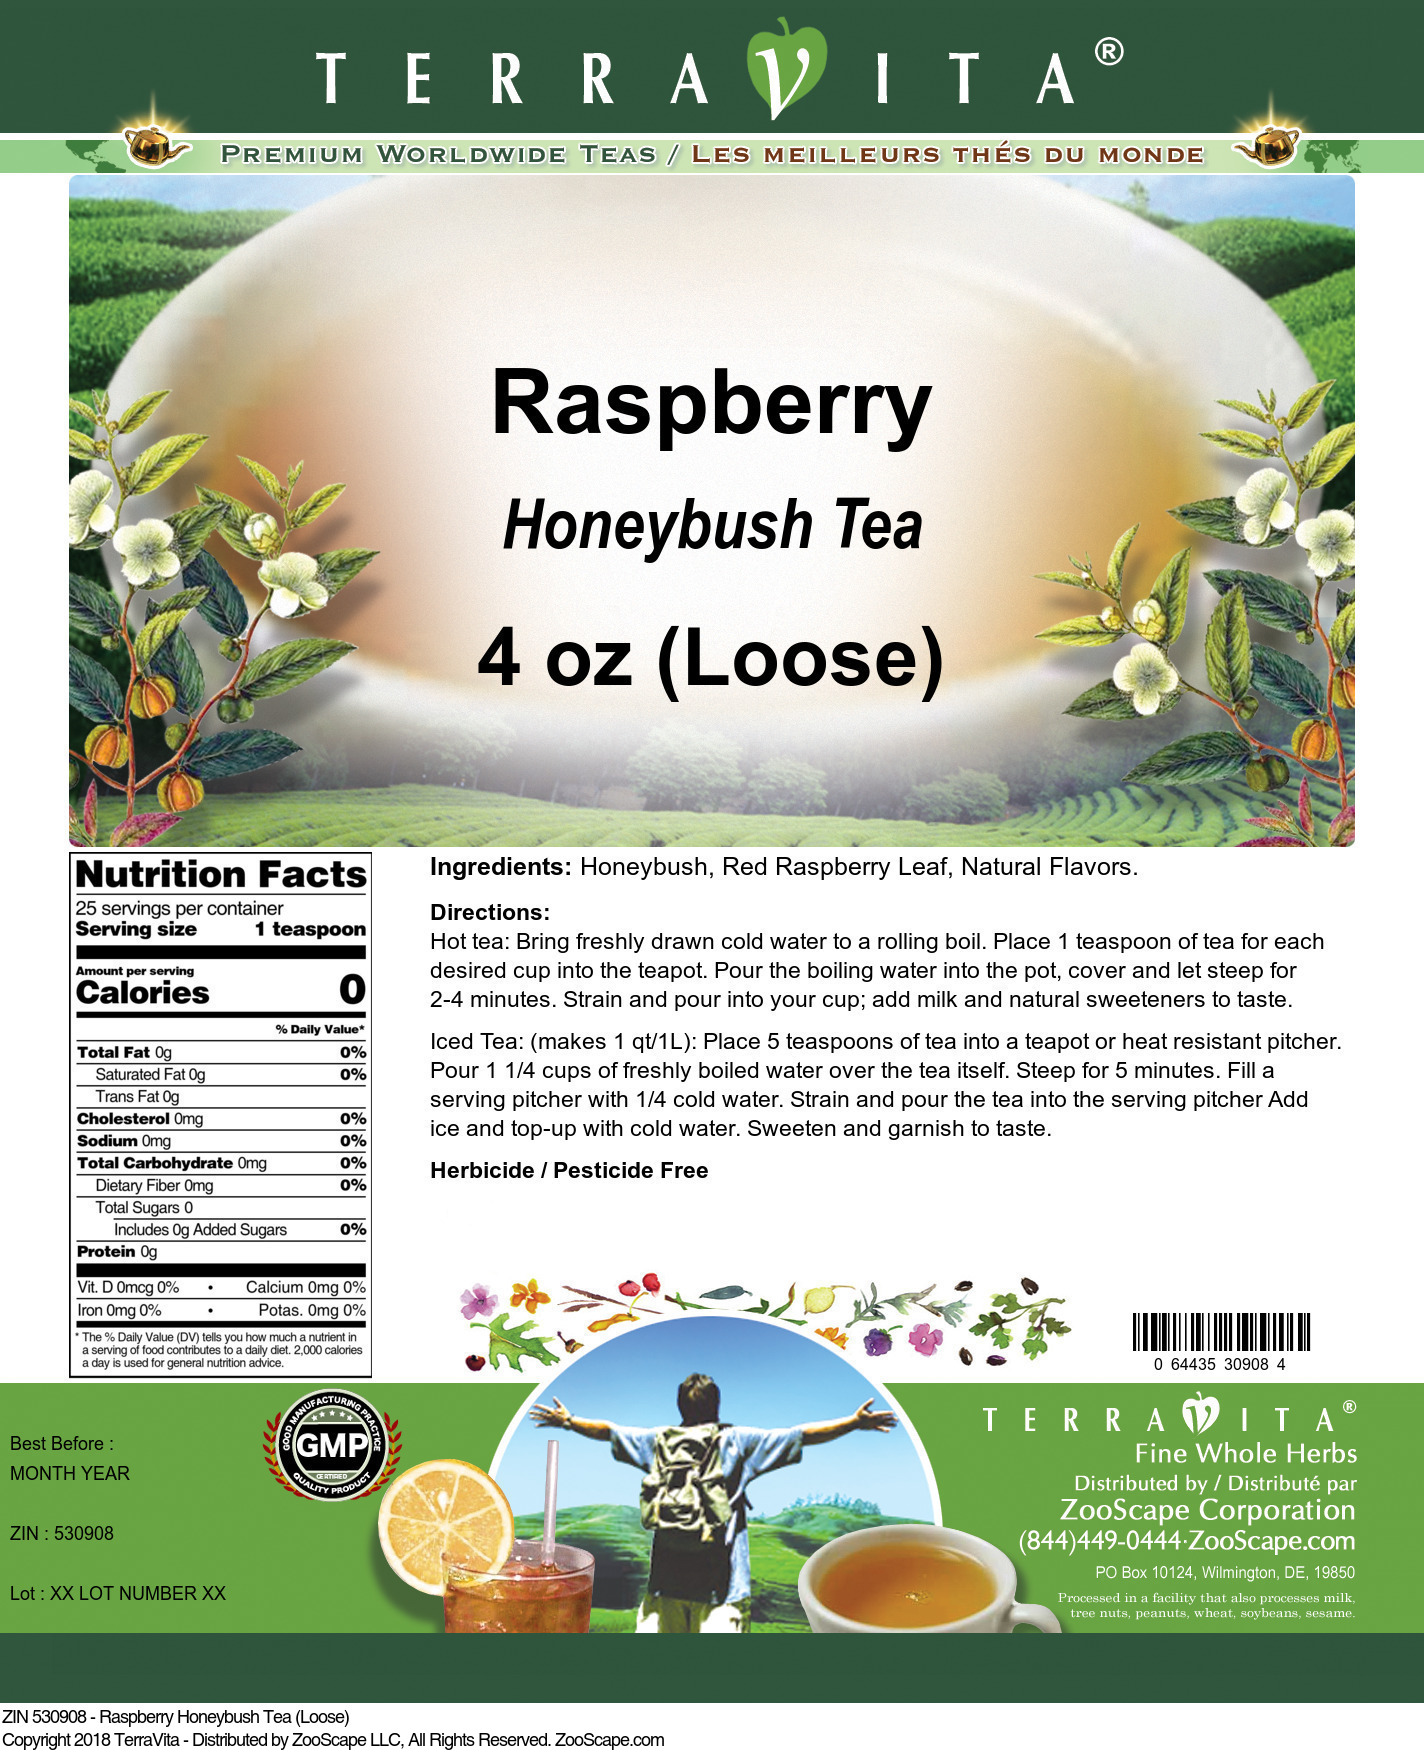 Raspberry Honeybush Tea (Loose)